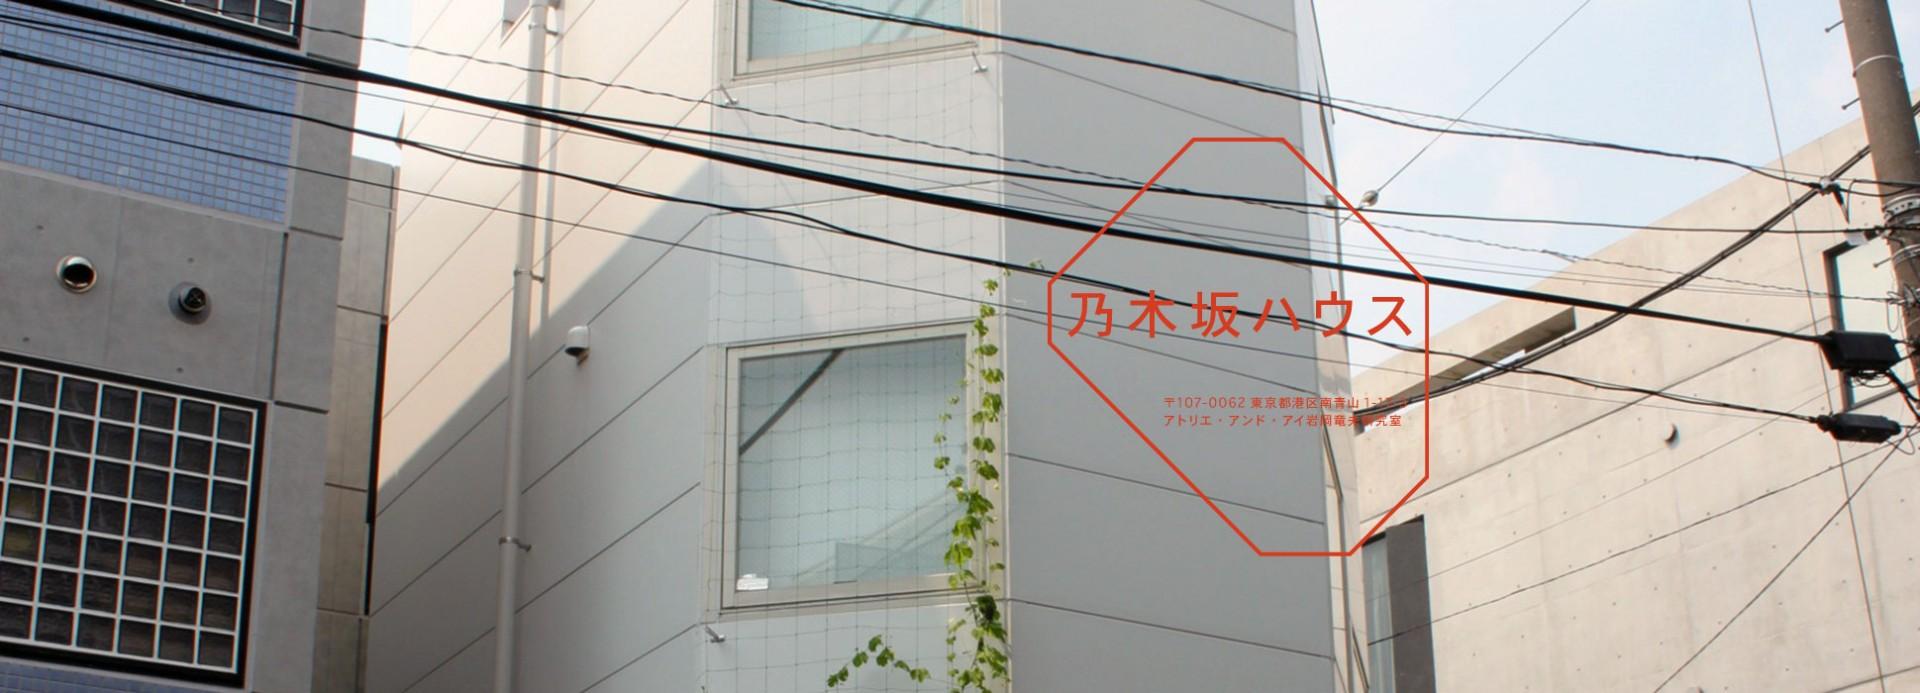 "Guest Lecture: ""Urban Topography vs. House Scenery"" – Tatsuo Iwaoka"